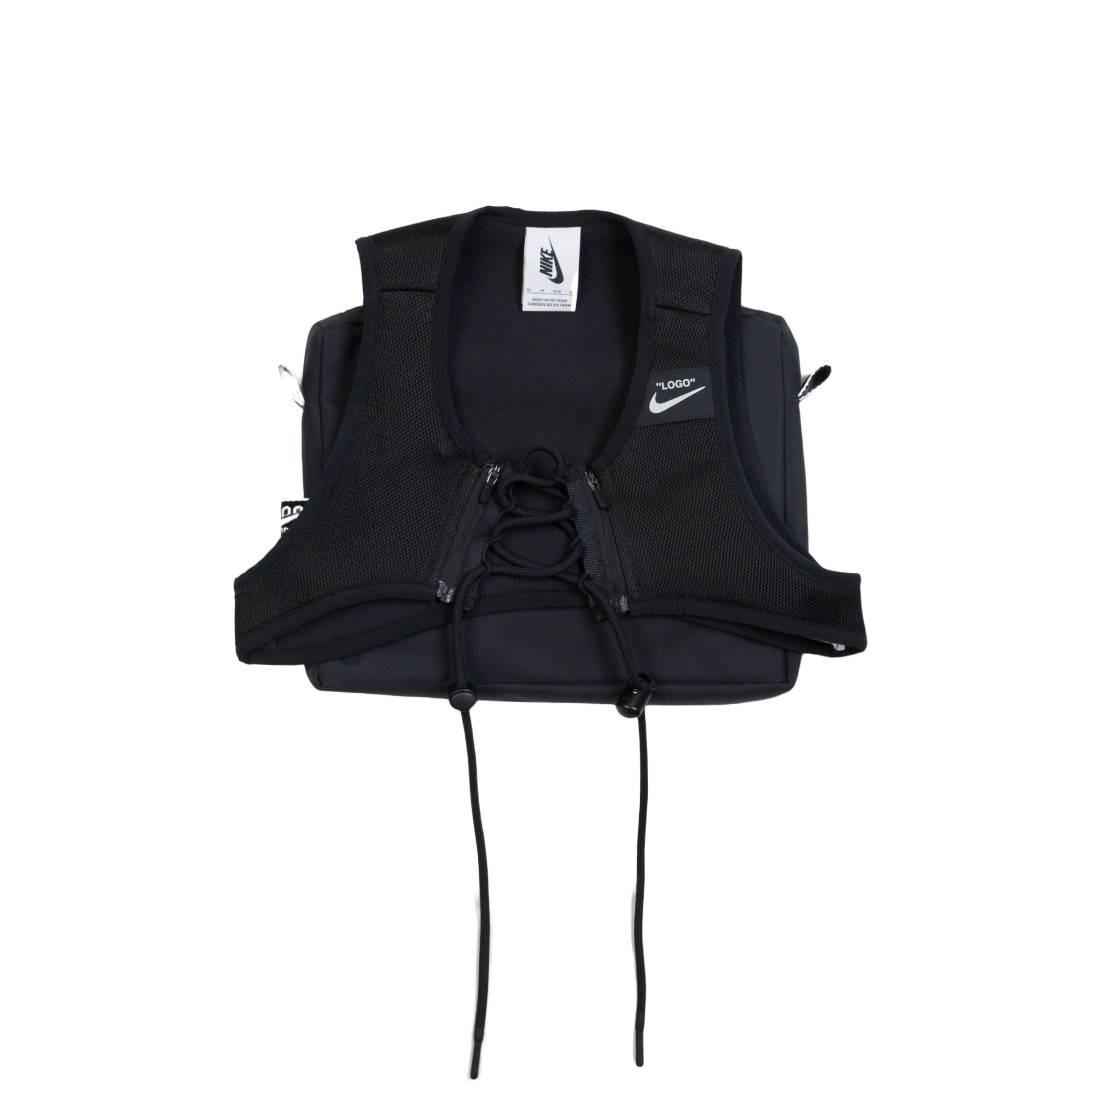 Nike X Off-White Women Nrg As #1 Xcross Bib (black)